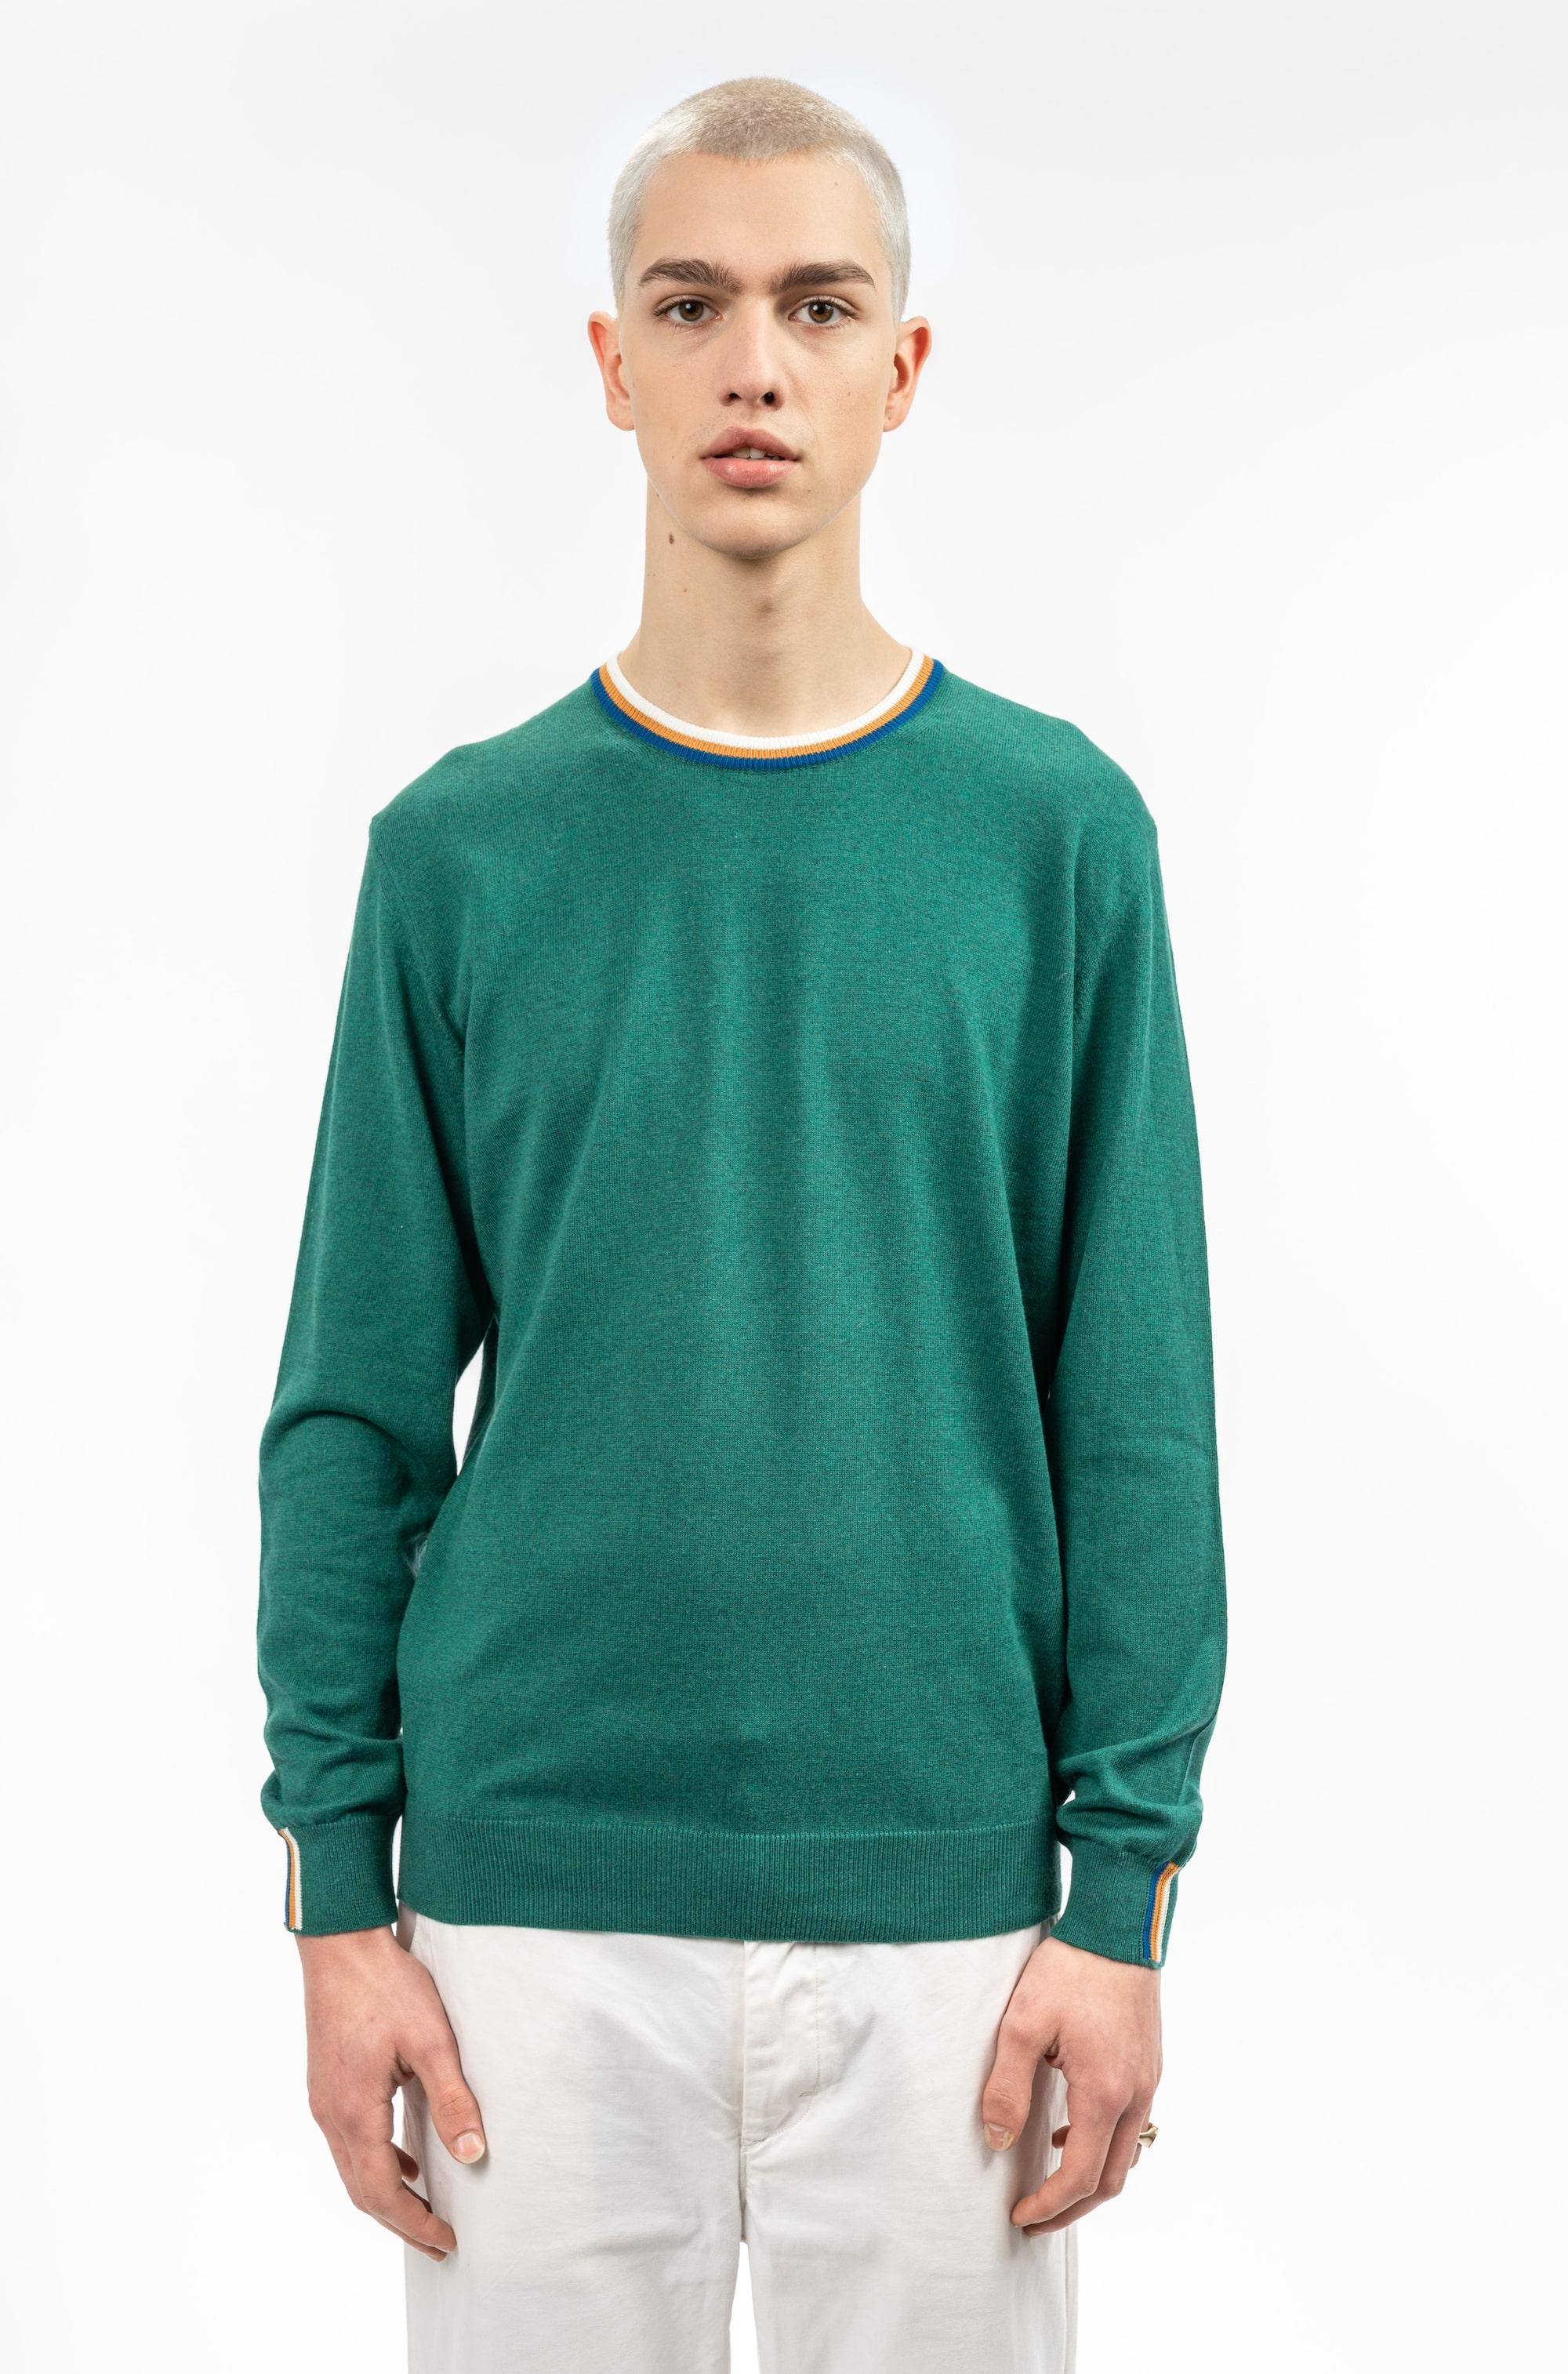 shop castart men's clothing